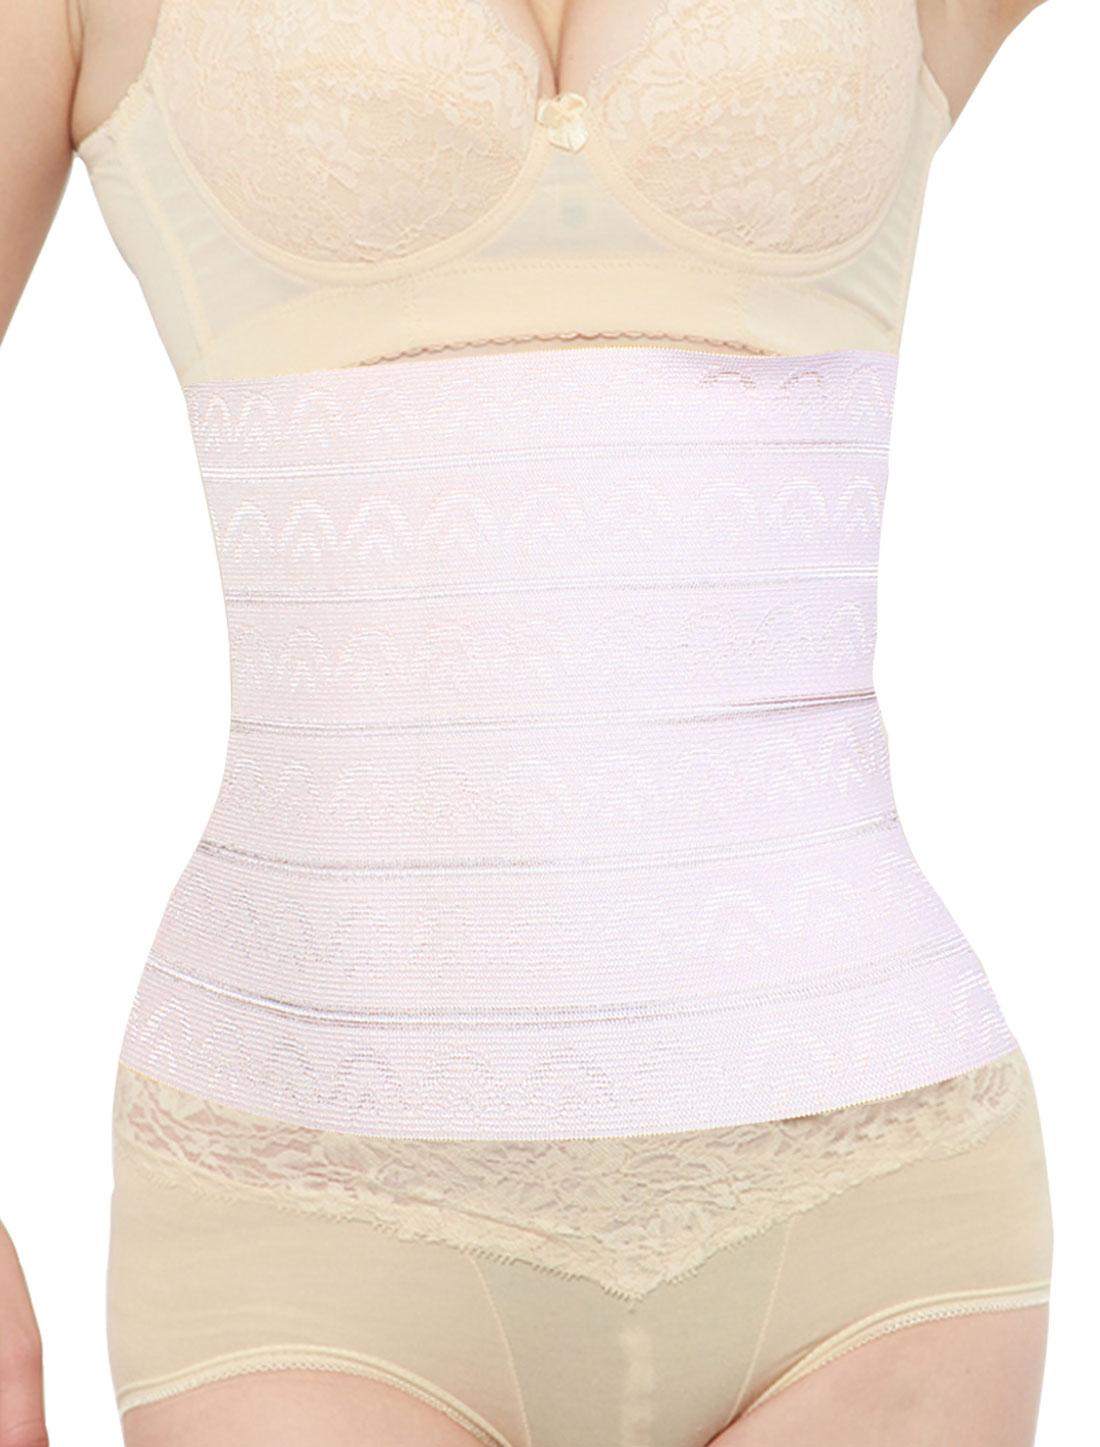 Lady Elastic Shapewear Underbust Slimming Belt Corset Waist Cincher XS Pink